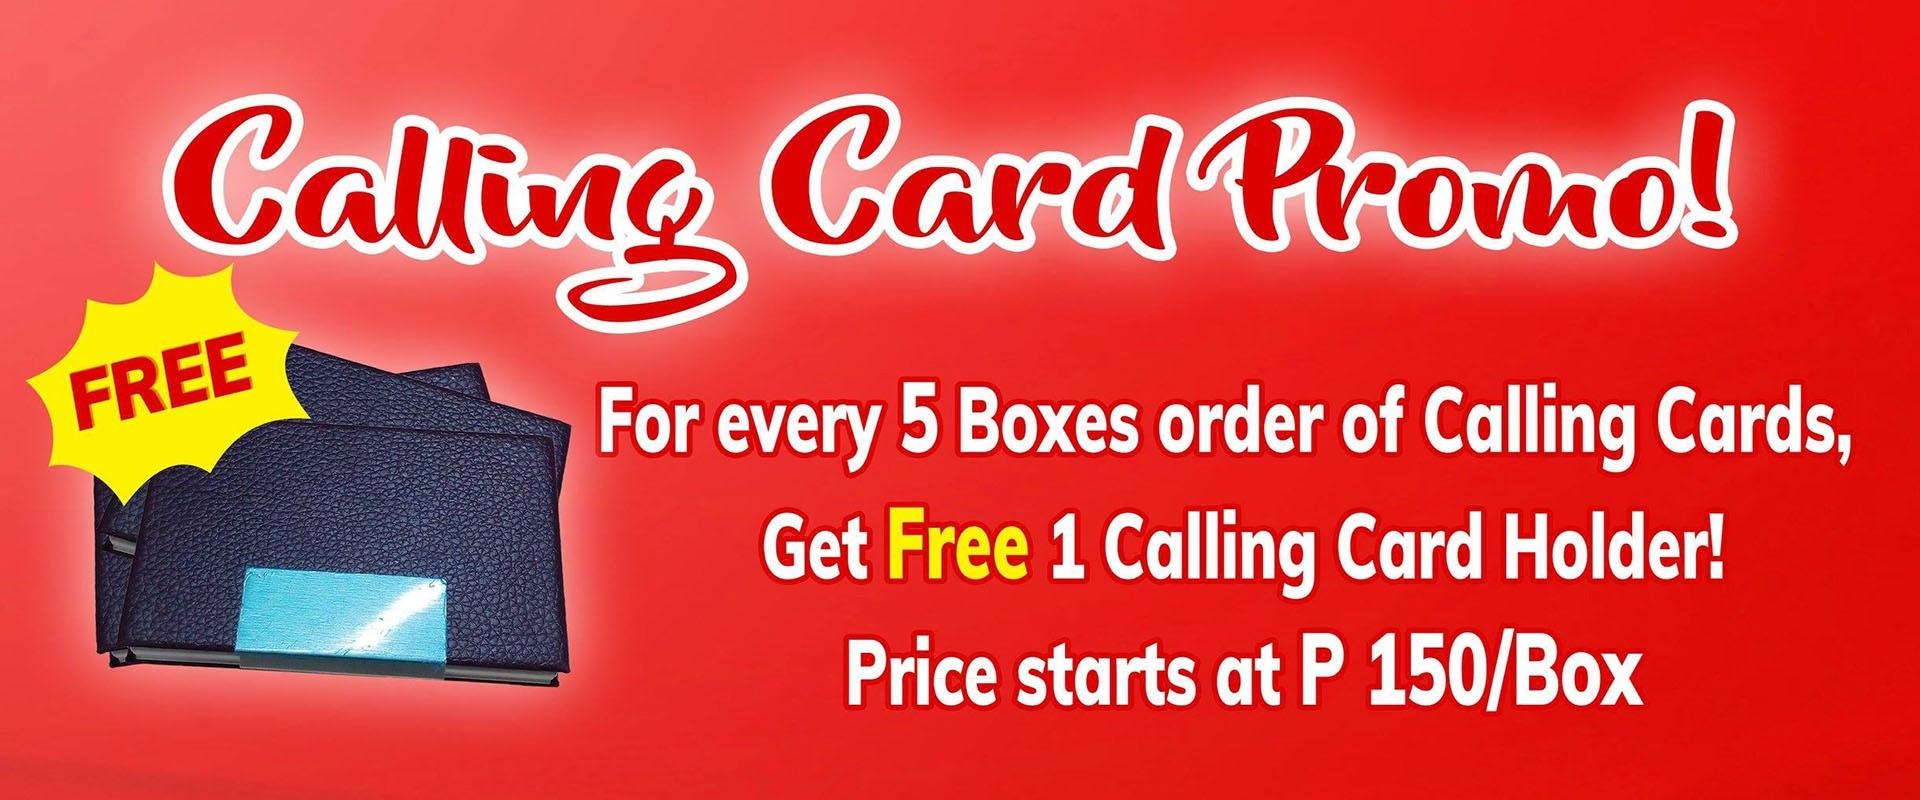 Dmc Busa Printshoppe - More Than Just Printing_Calendar Printing Press In Cebu